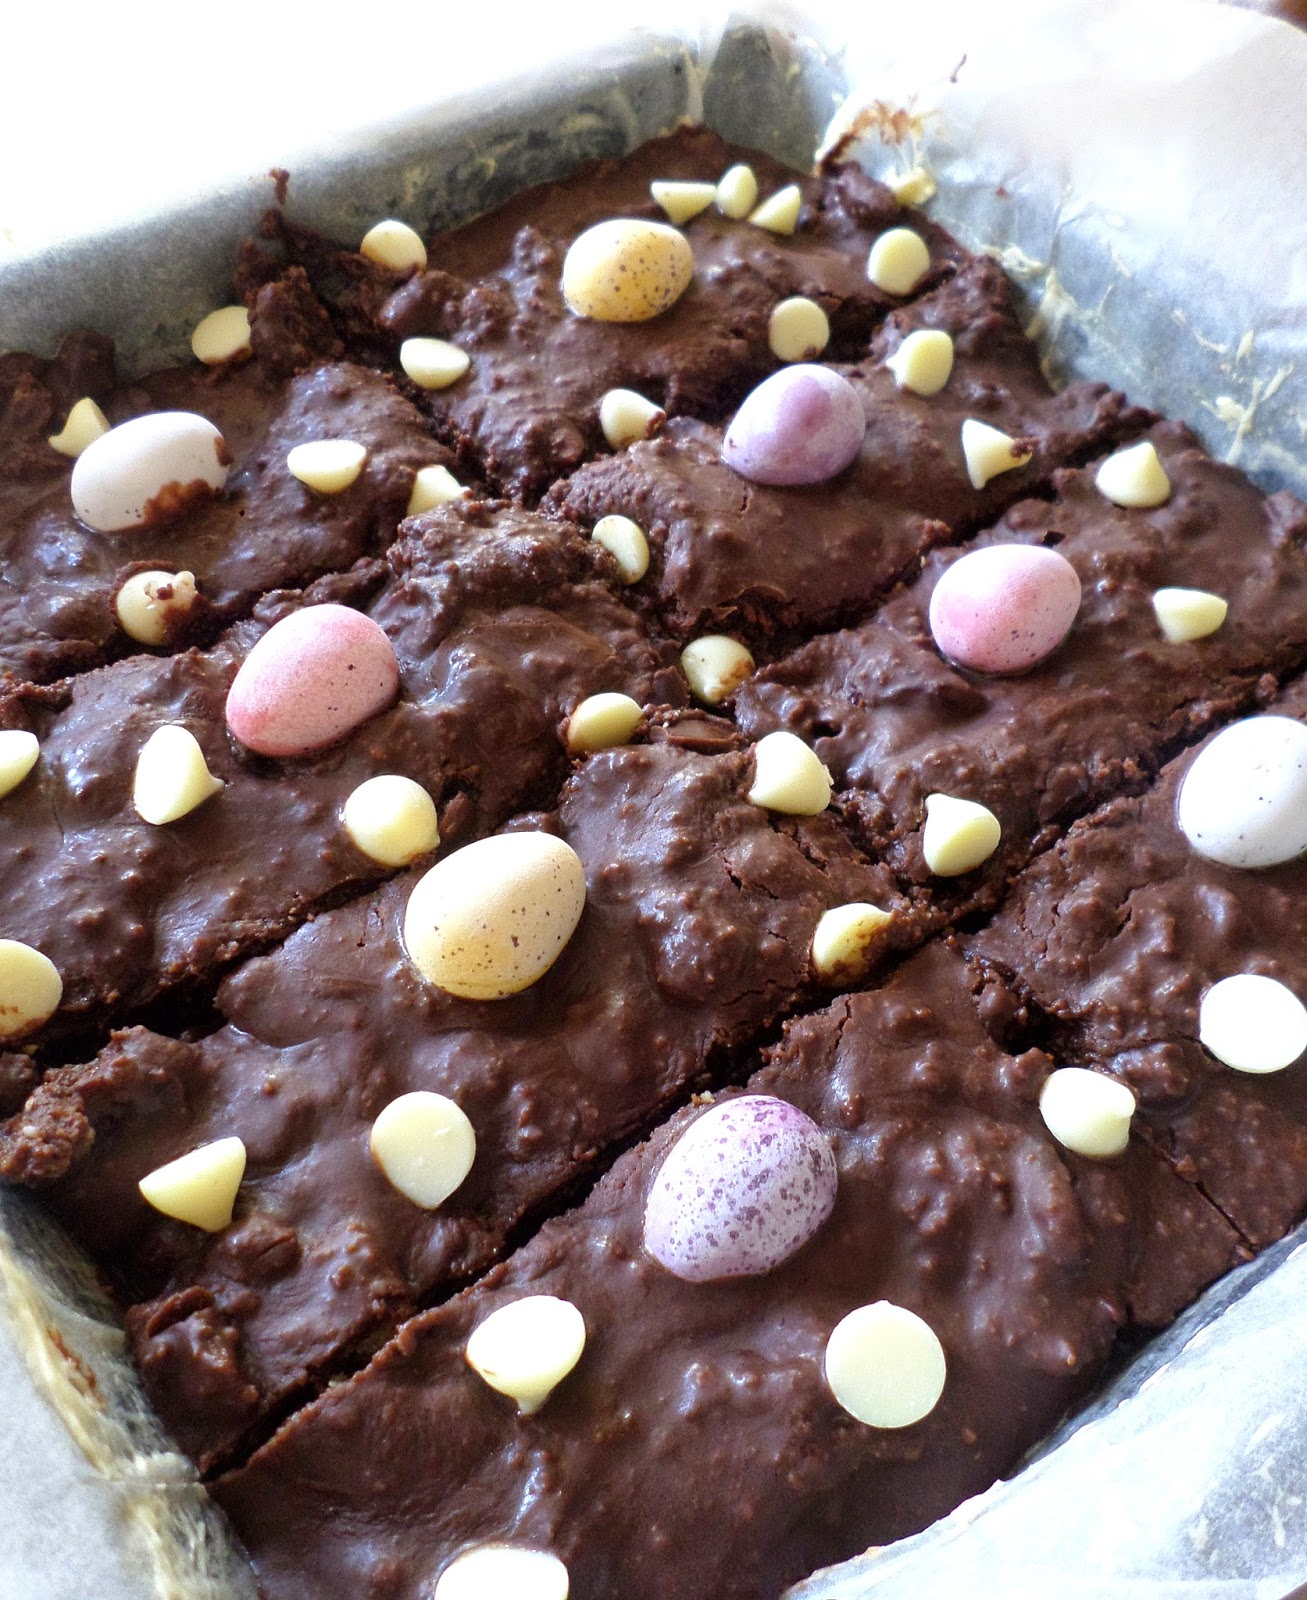 Poundland Dark Chocolate Craberries